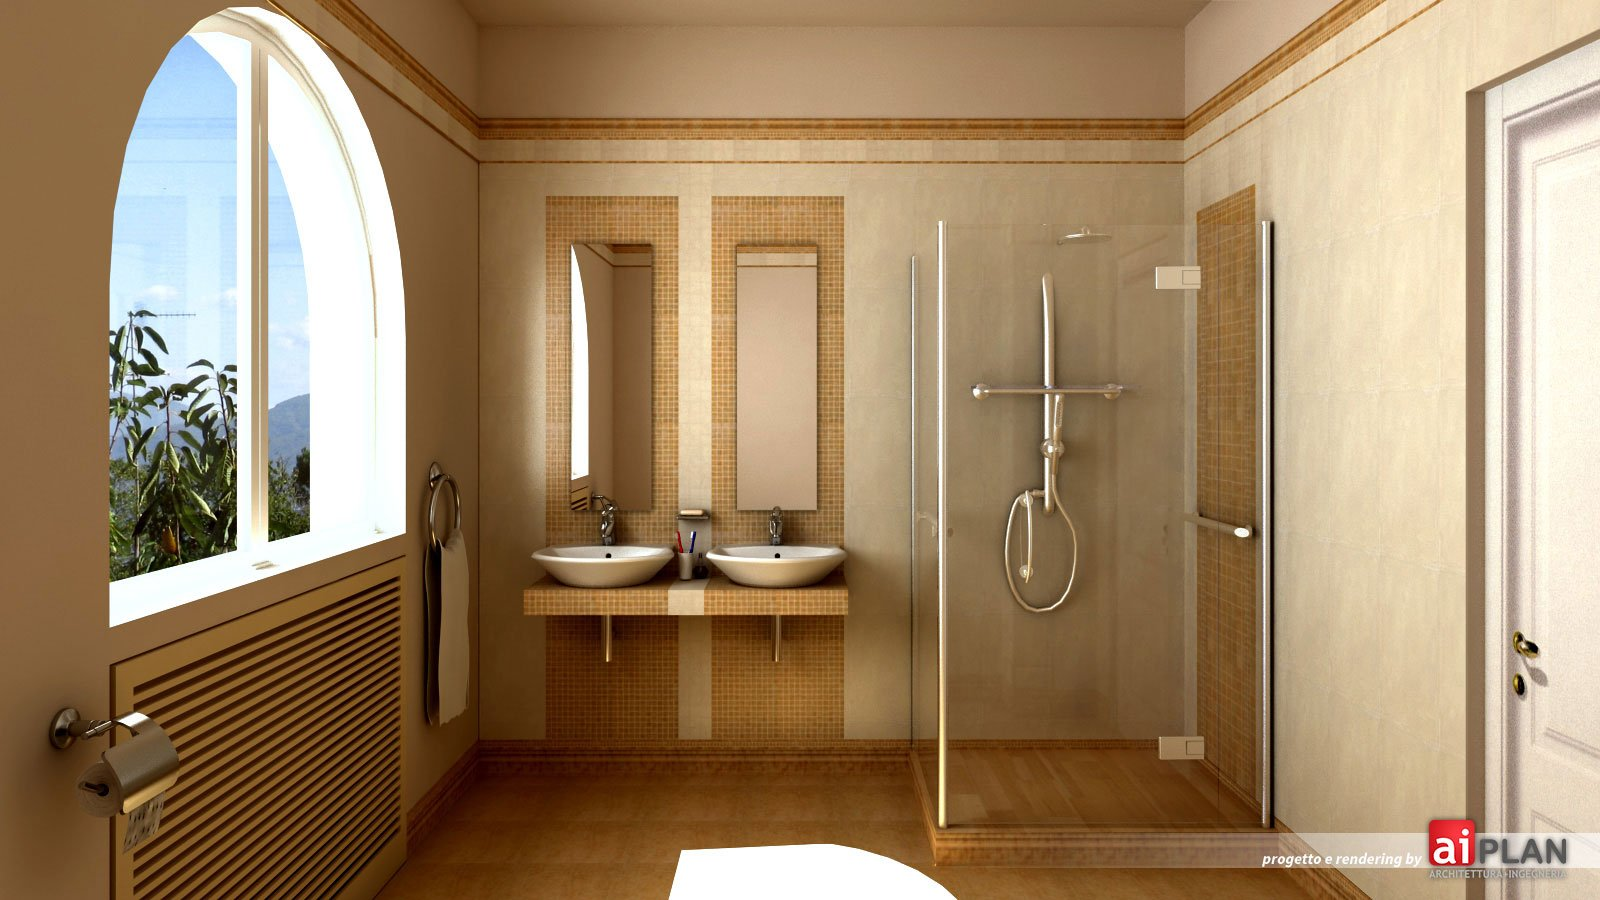 Versace arredamento casa opere delluarte in foto duepoca - Arredo bagno versace home ...